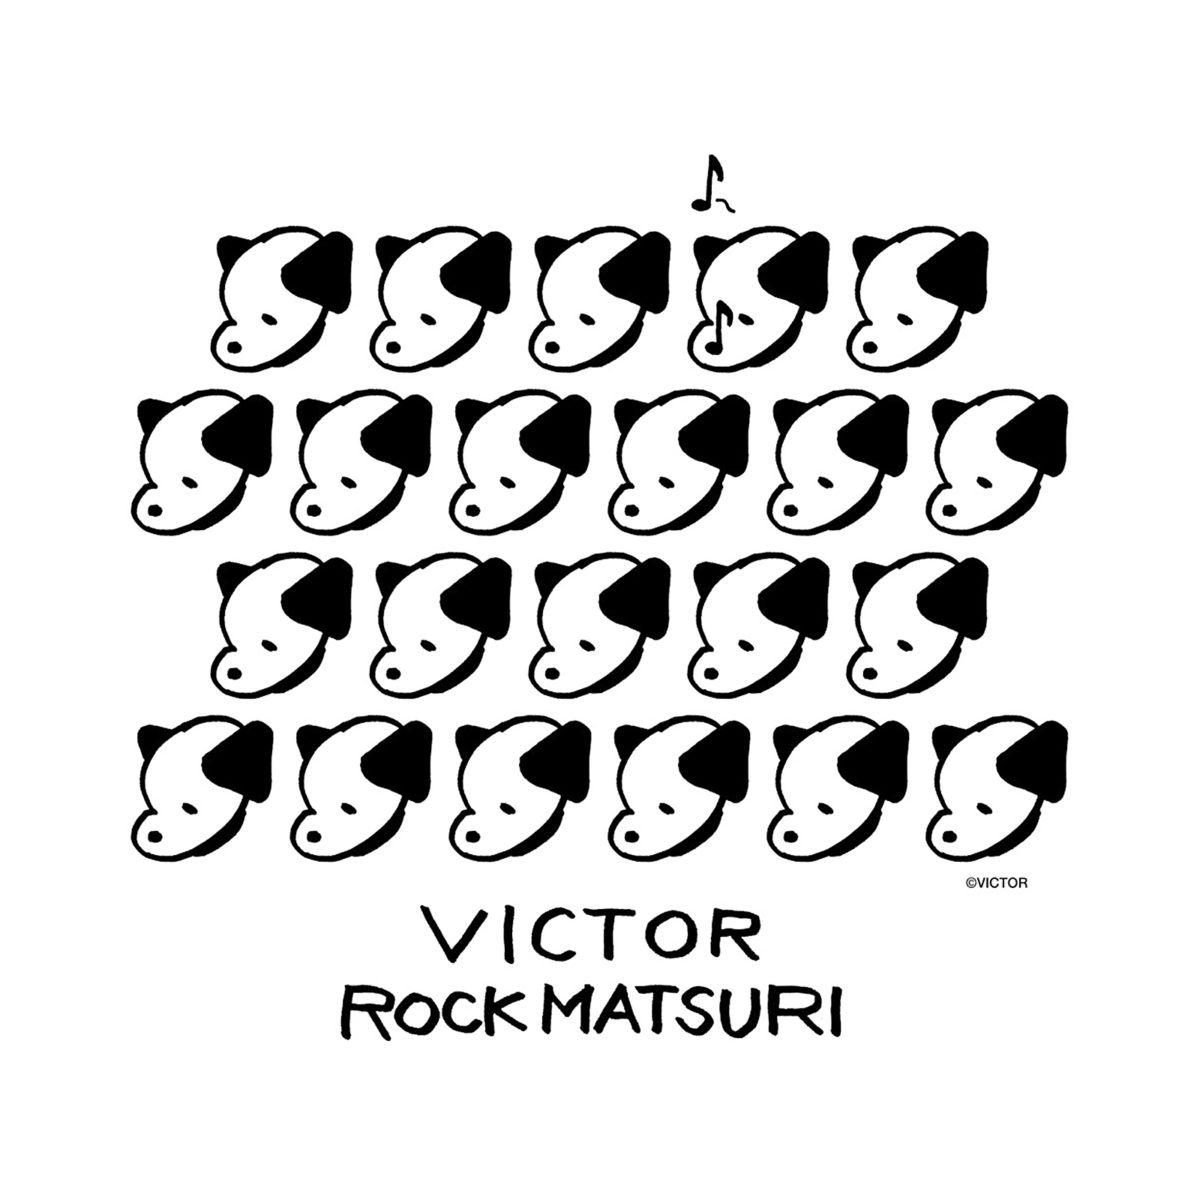 VICTOR ROCK MATSURI